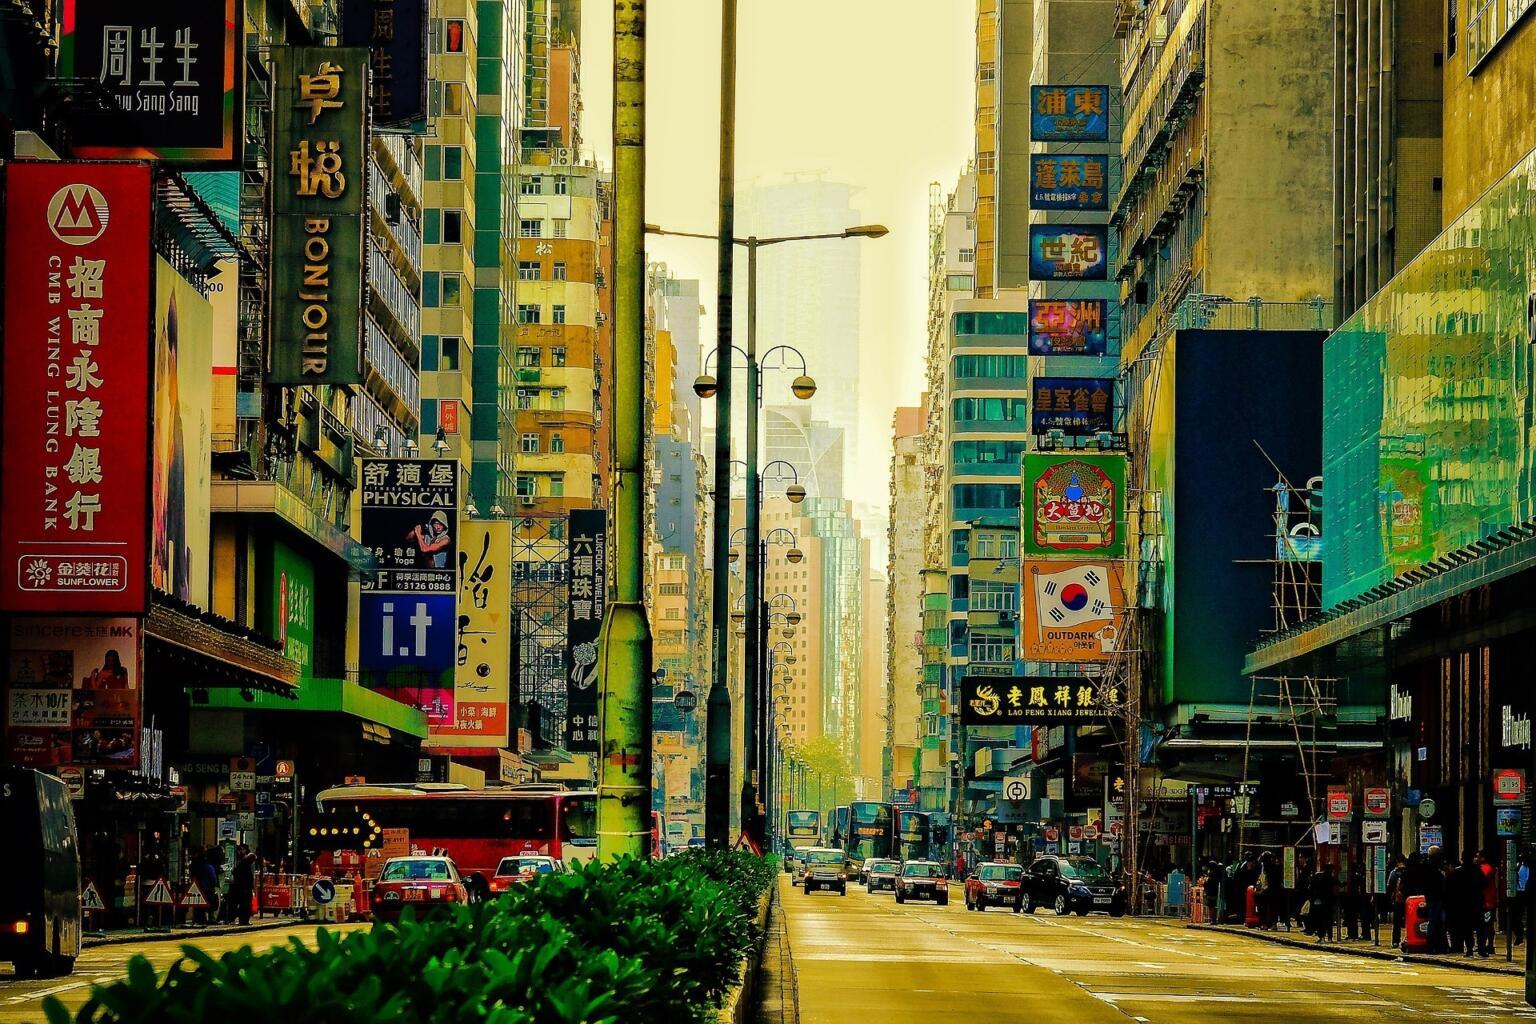 The Mong Kok Ladies Market